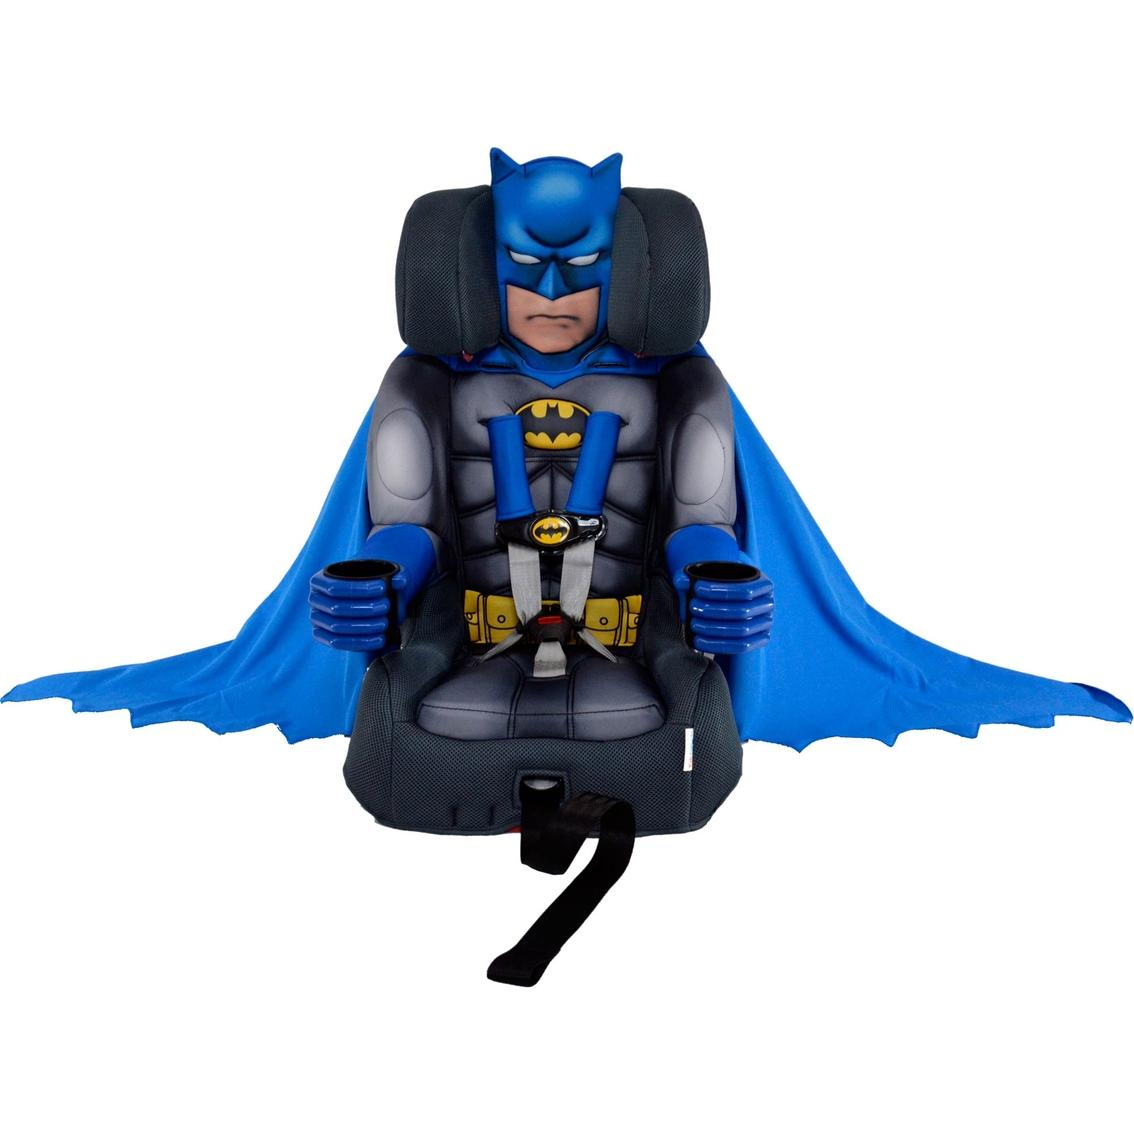 Kidsembrace Batman Friendship Combination Booster Car Seat | Car ...